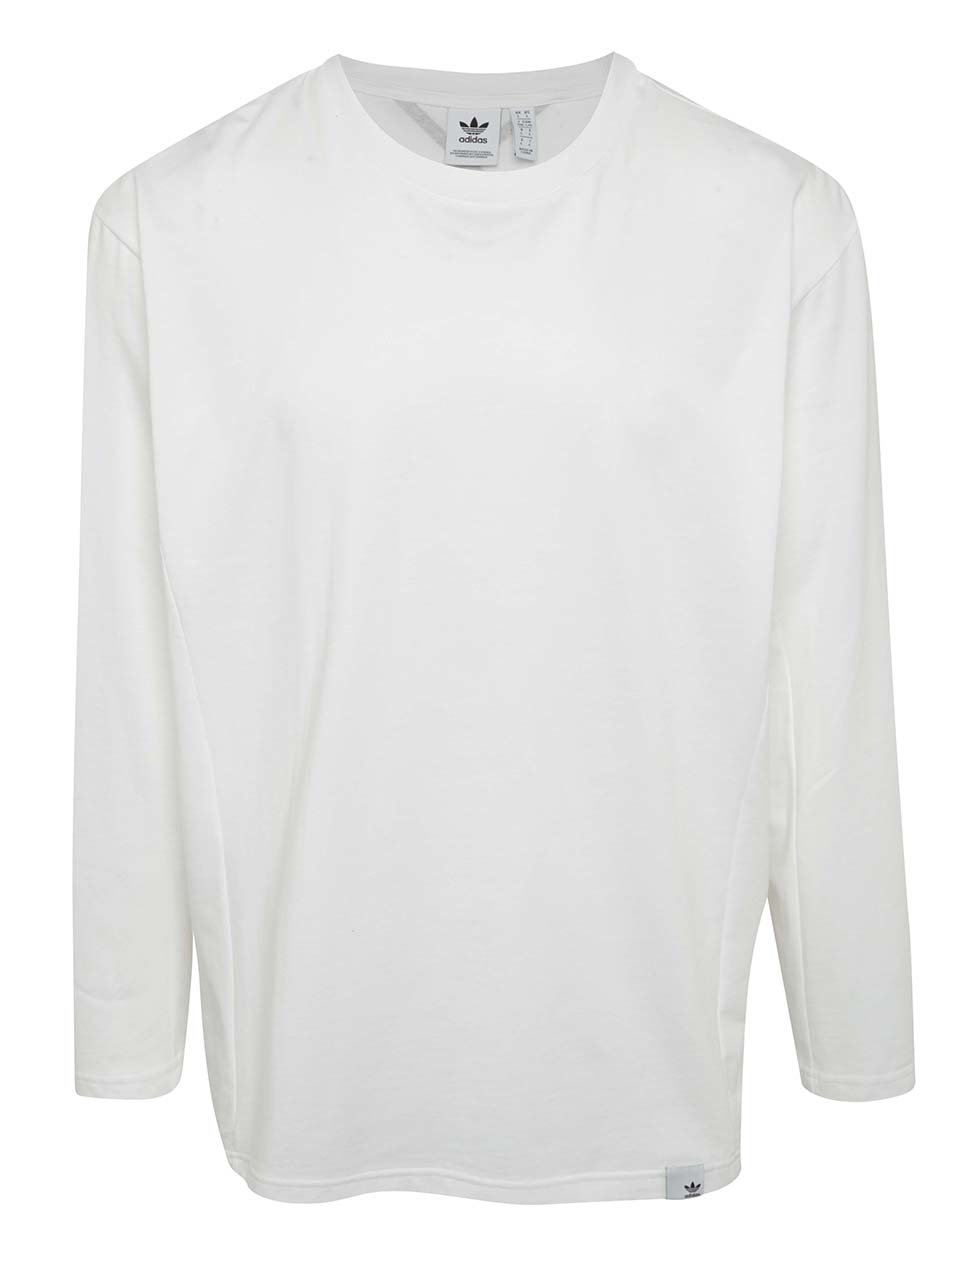 Bílé pánské tričko s dlouhým rukávem adidas Originals XBYO ... 89d2b1e4963